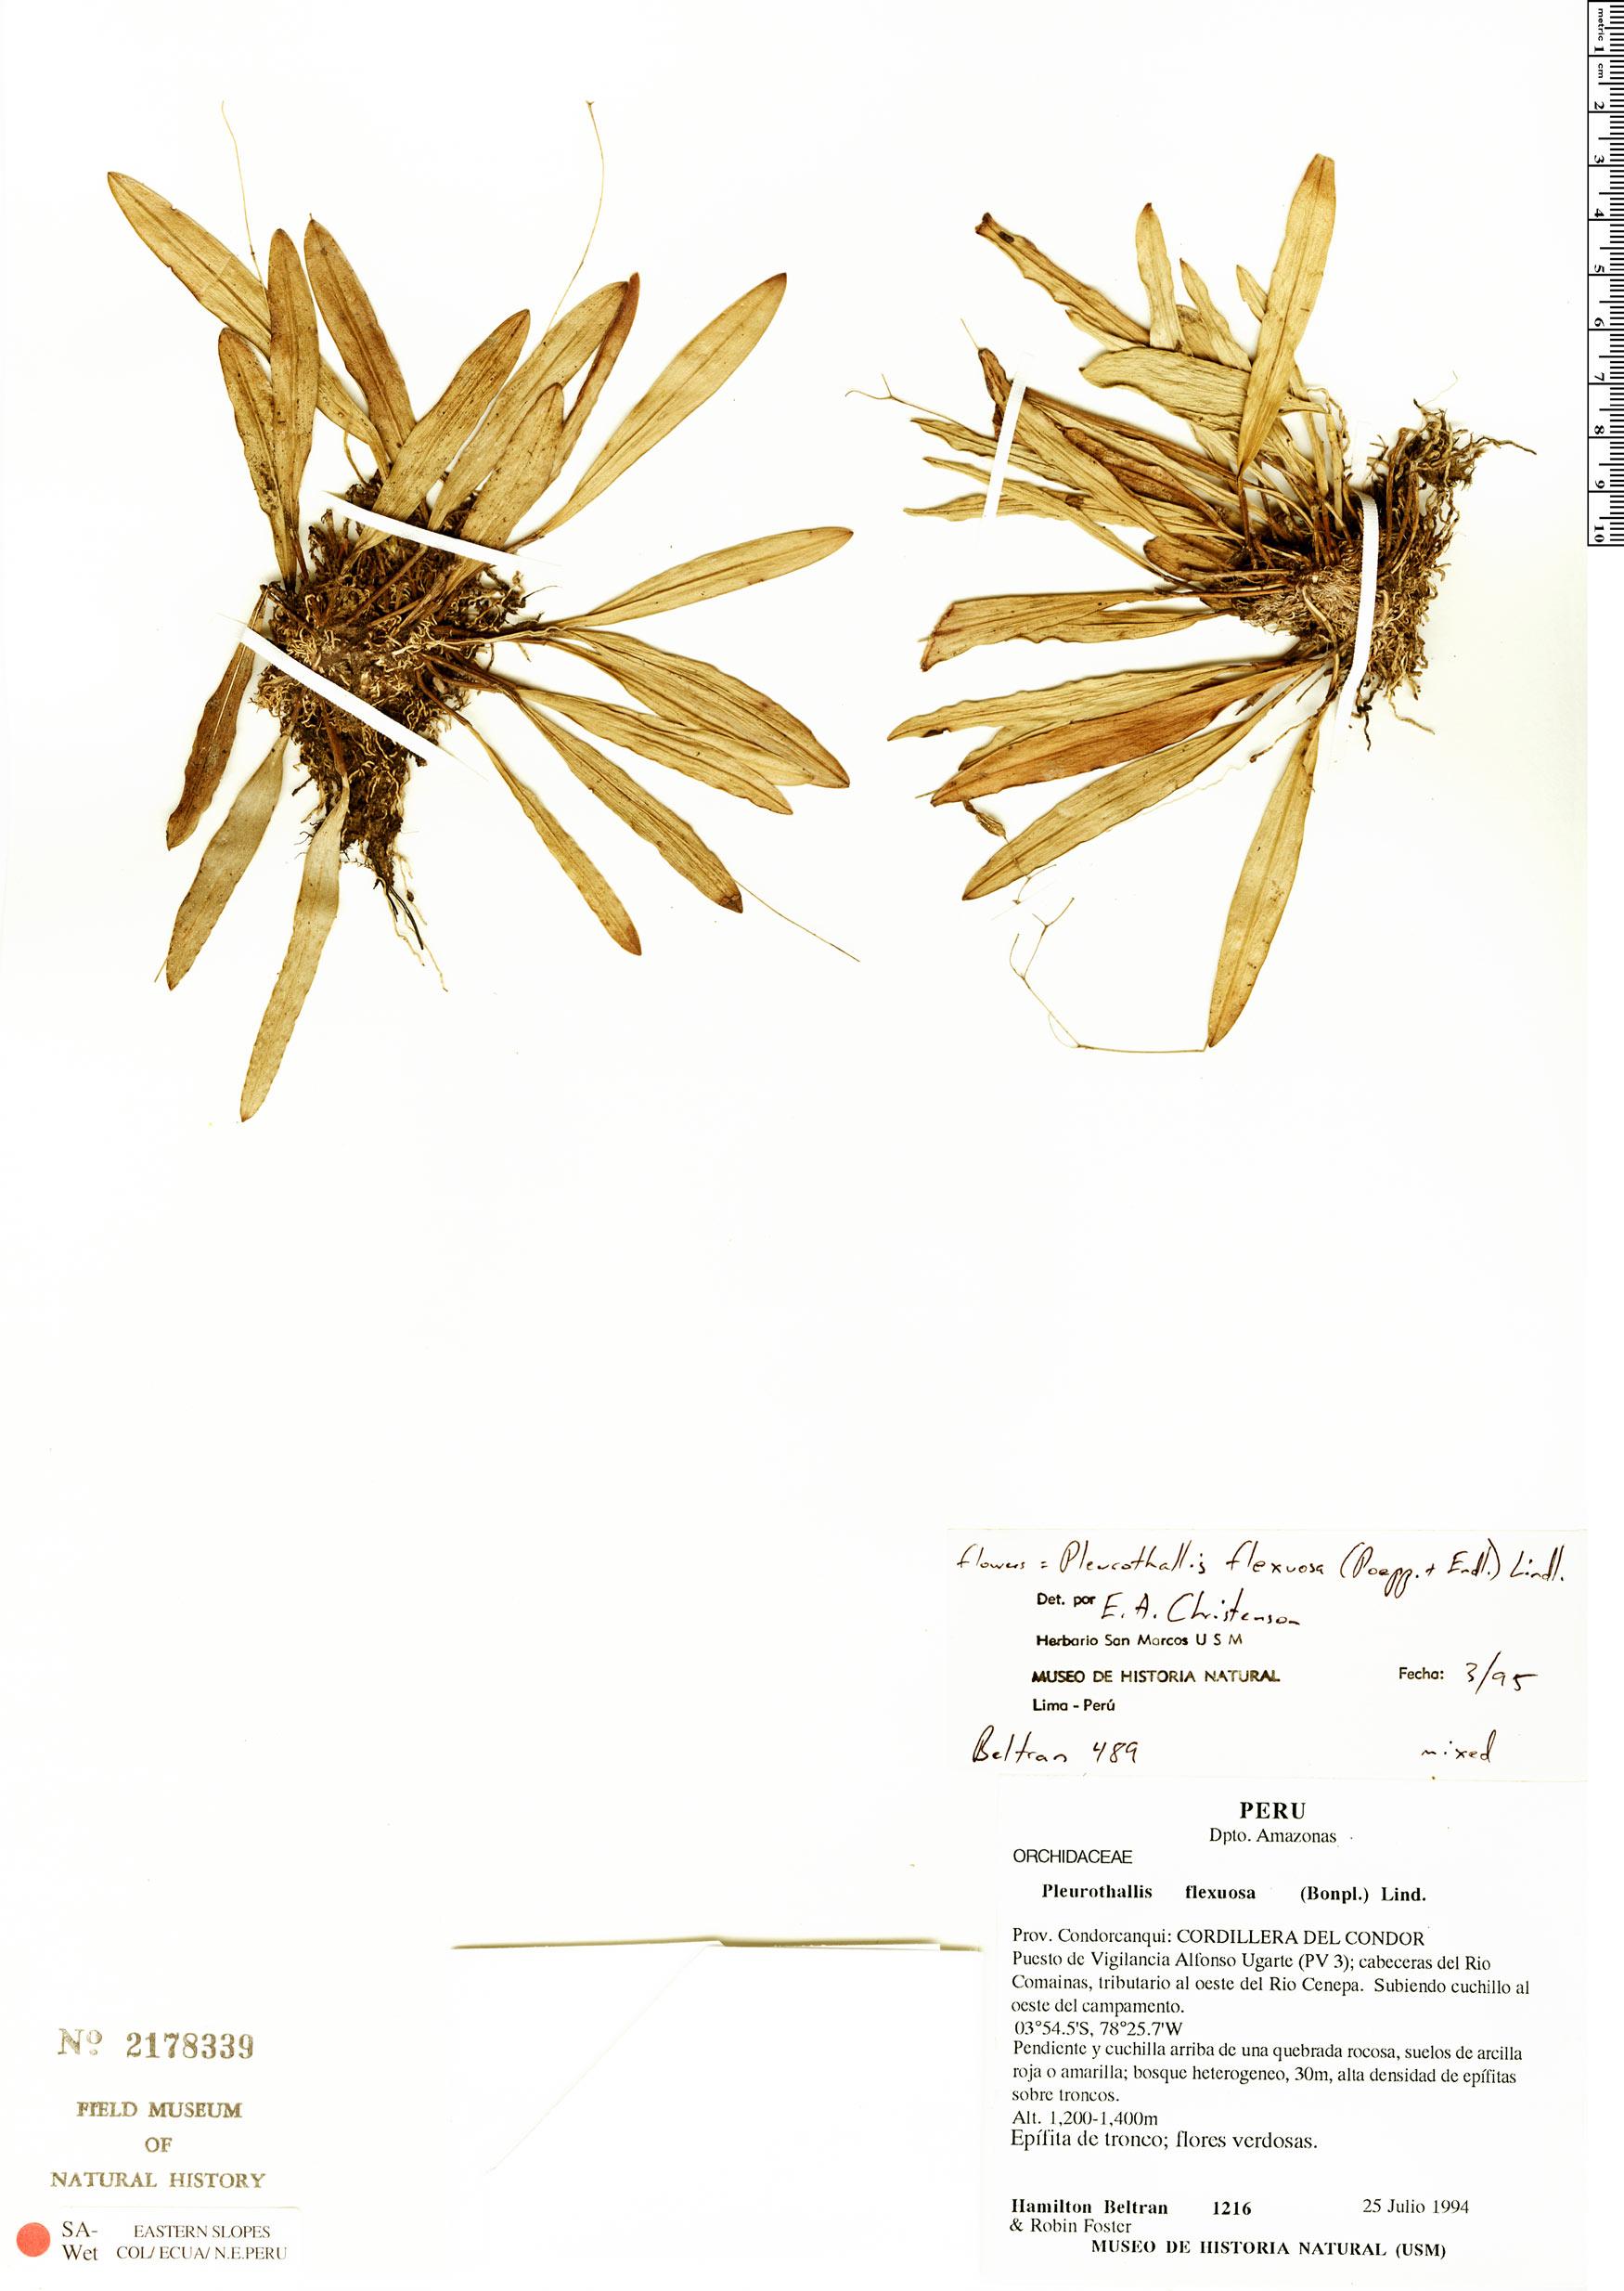 Specimen: Pleurothallis flexuosa